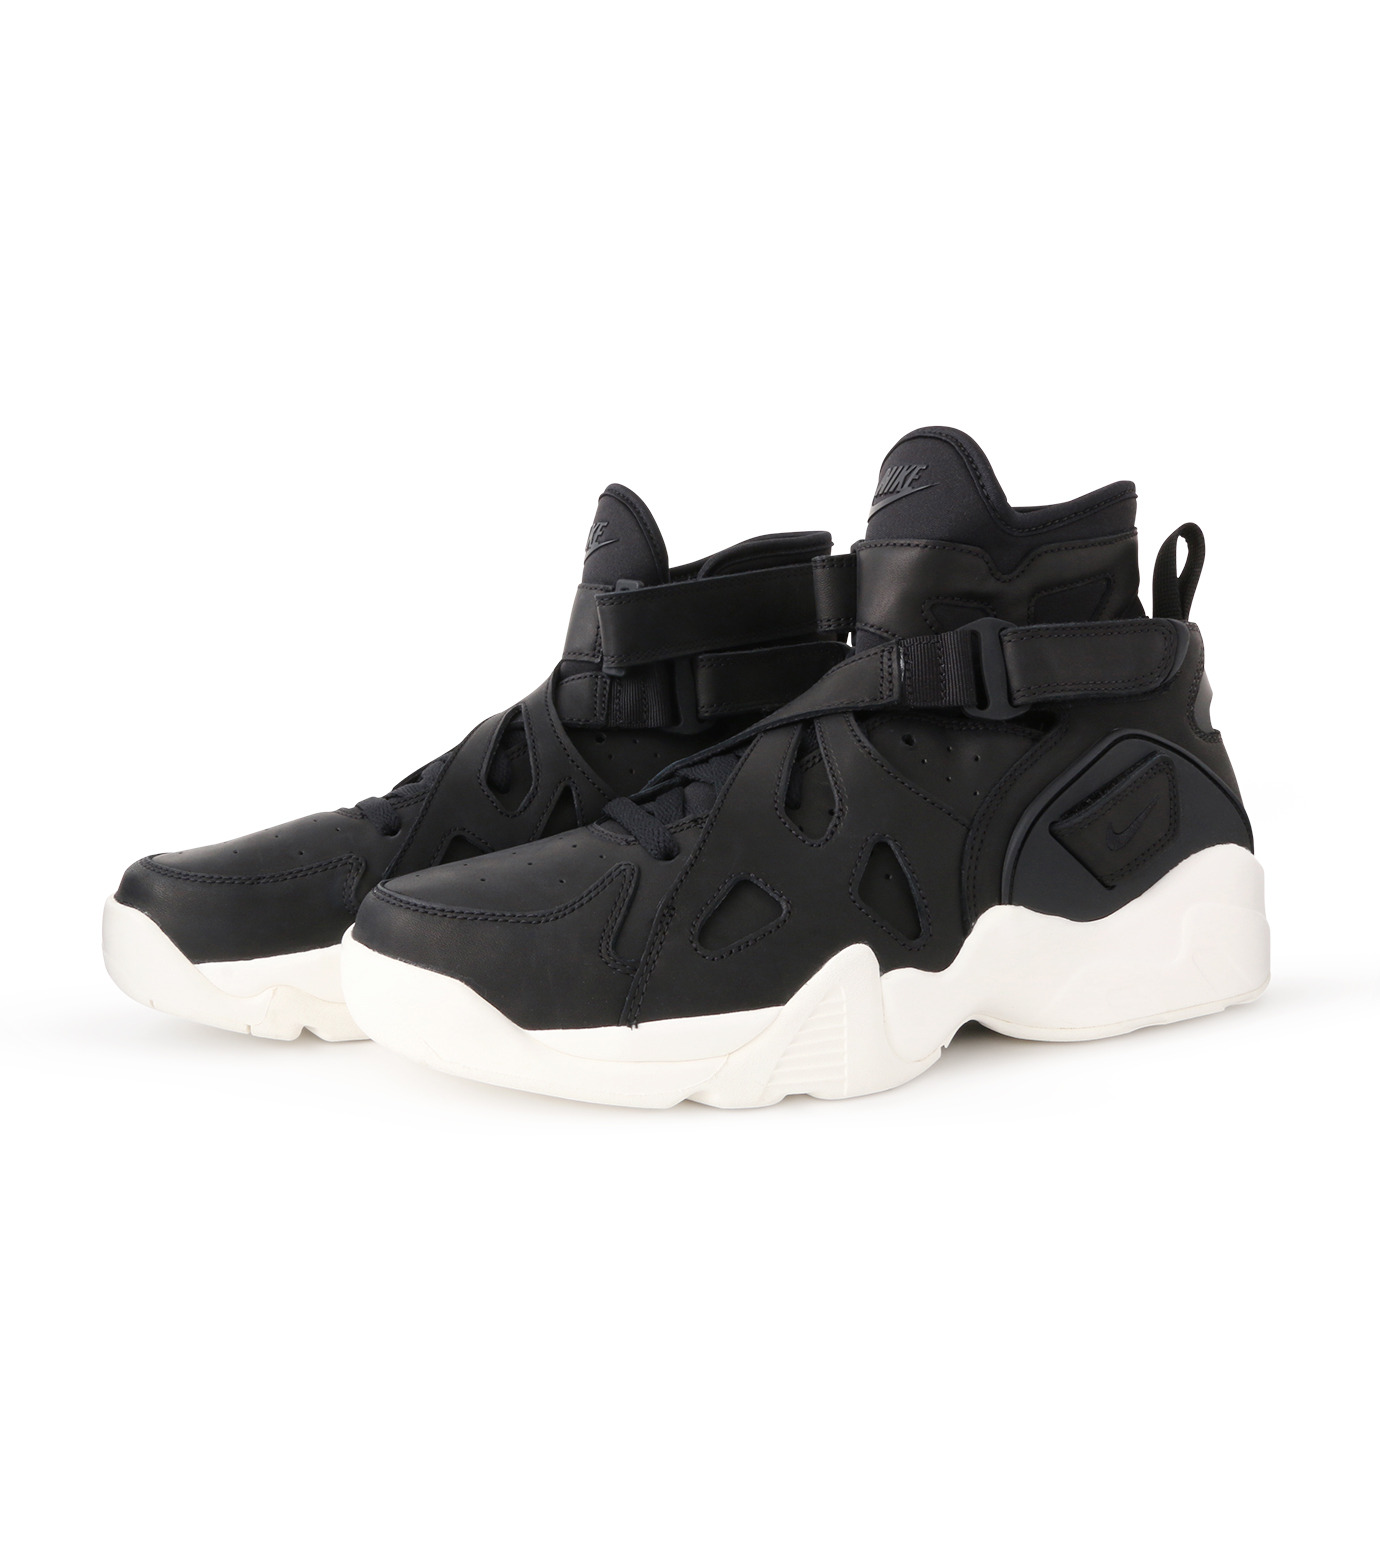 NIKE(ナイキ)のAIR UNLIMITED-BLACK(シューズ/shoes)-854318-003-13 拡大詳細画像3